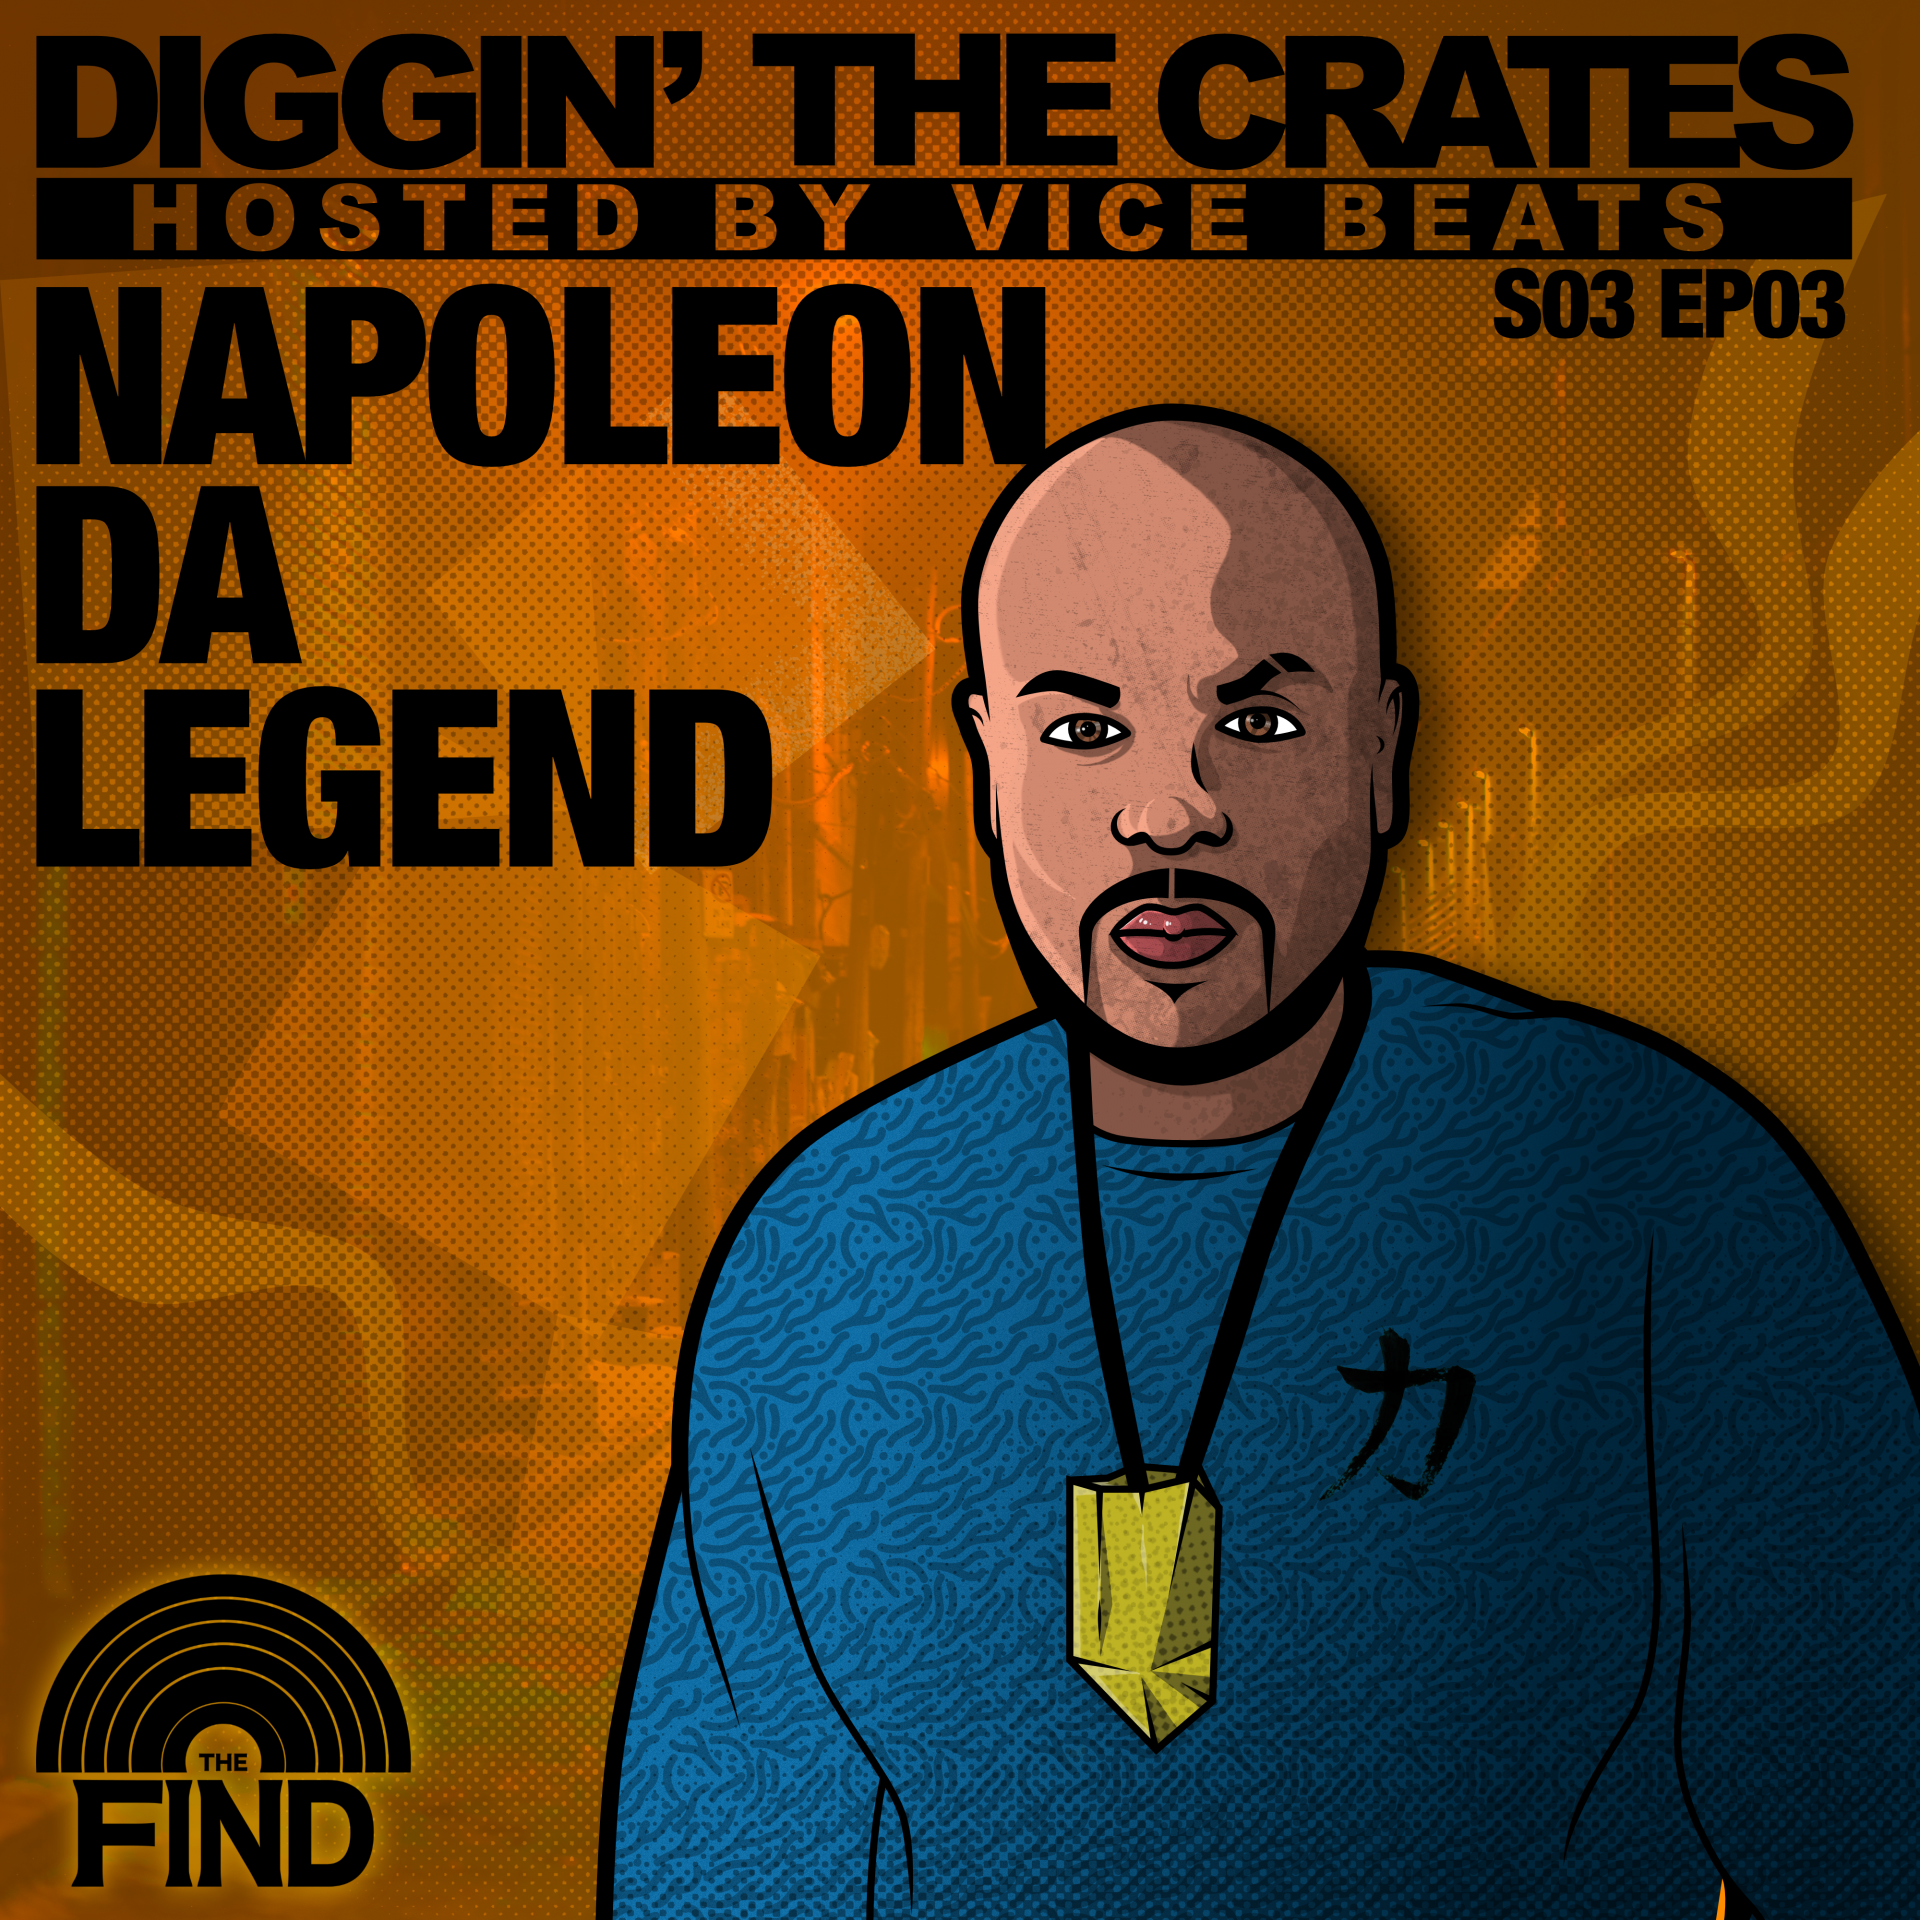 Napoleon da Legend (Diggin' The Crates Season 3 Episode 3)